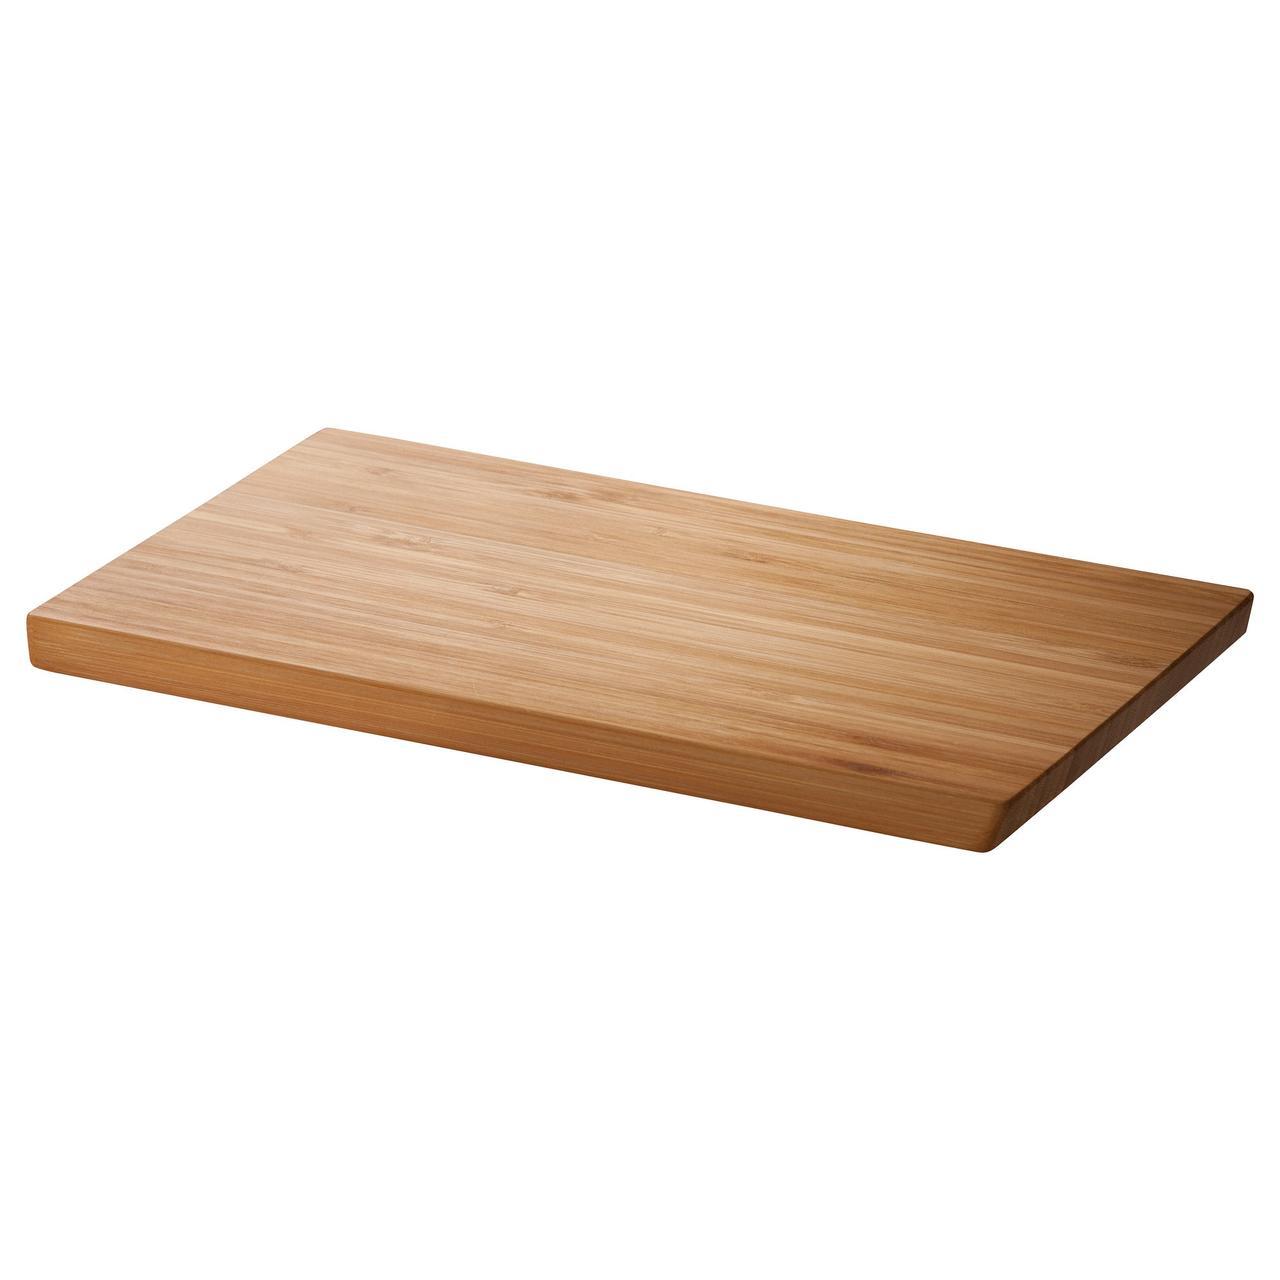 АПТИТЛИГ Разделочная доска, бамбук